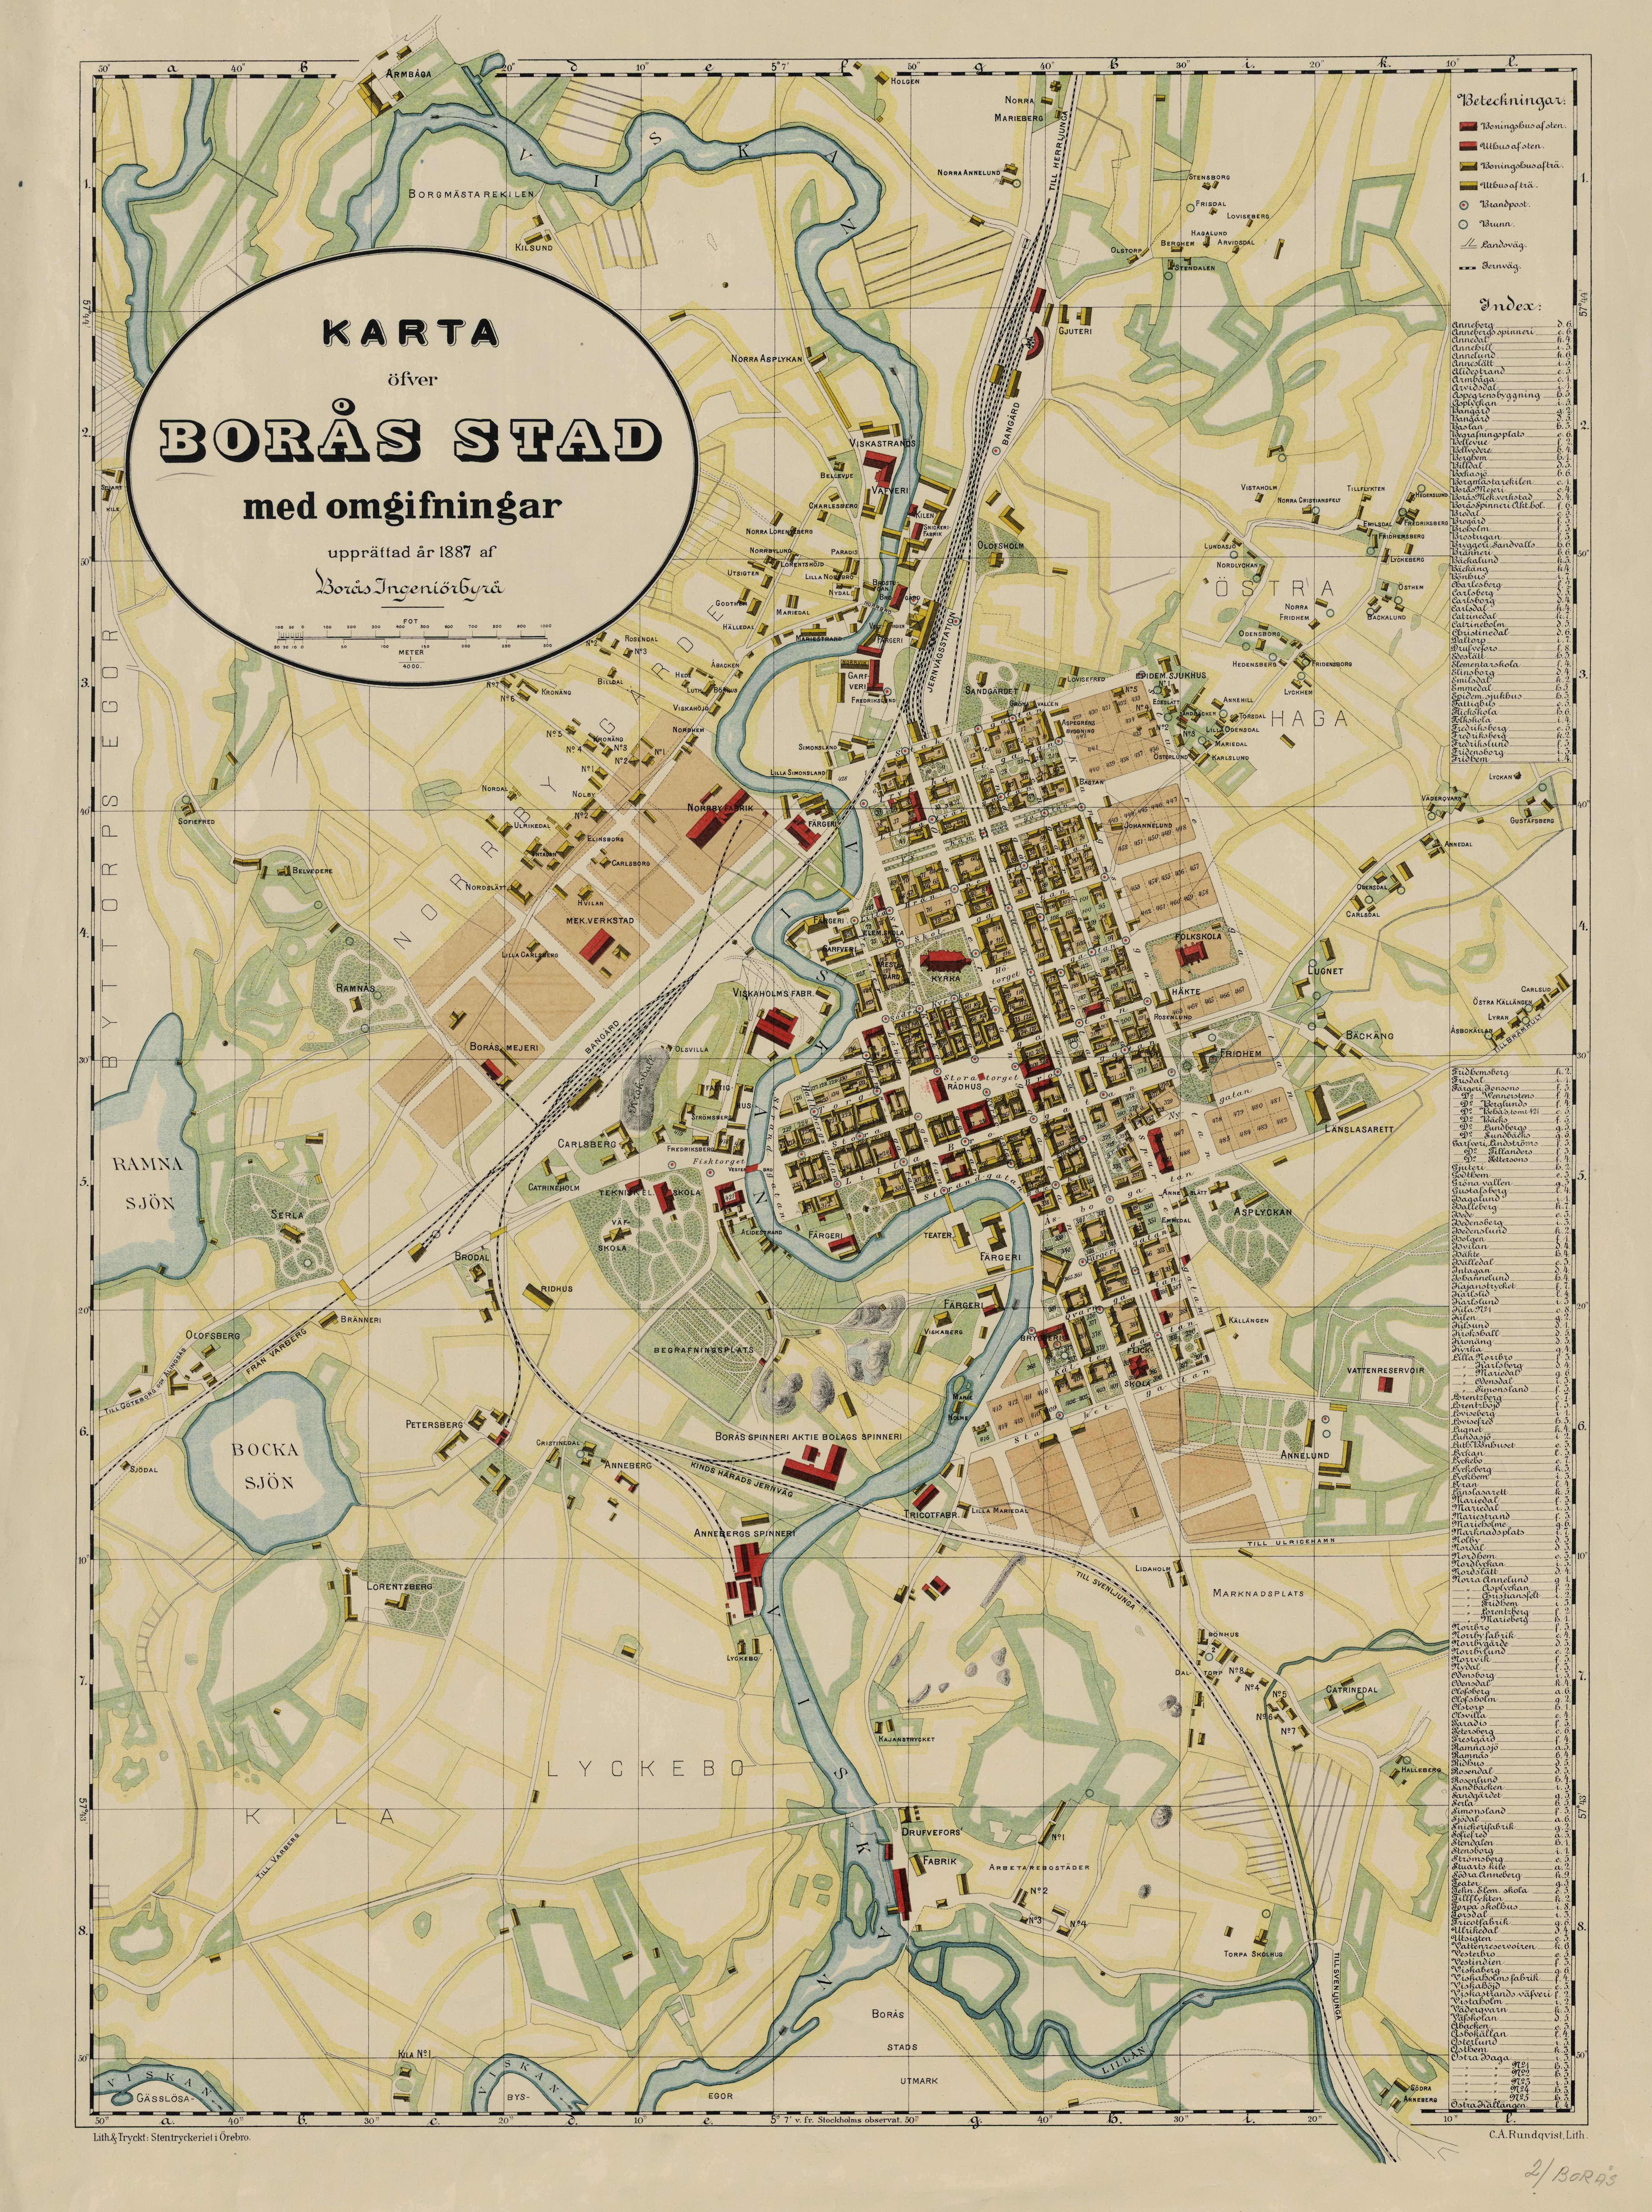 Karta Skulpturer Boras.Anvand Arkiven Boras Stad